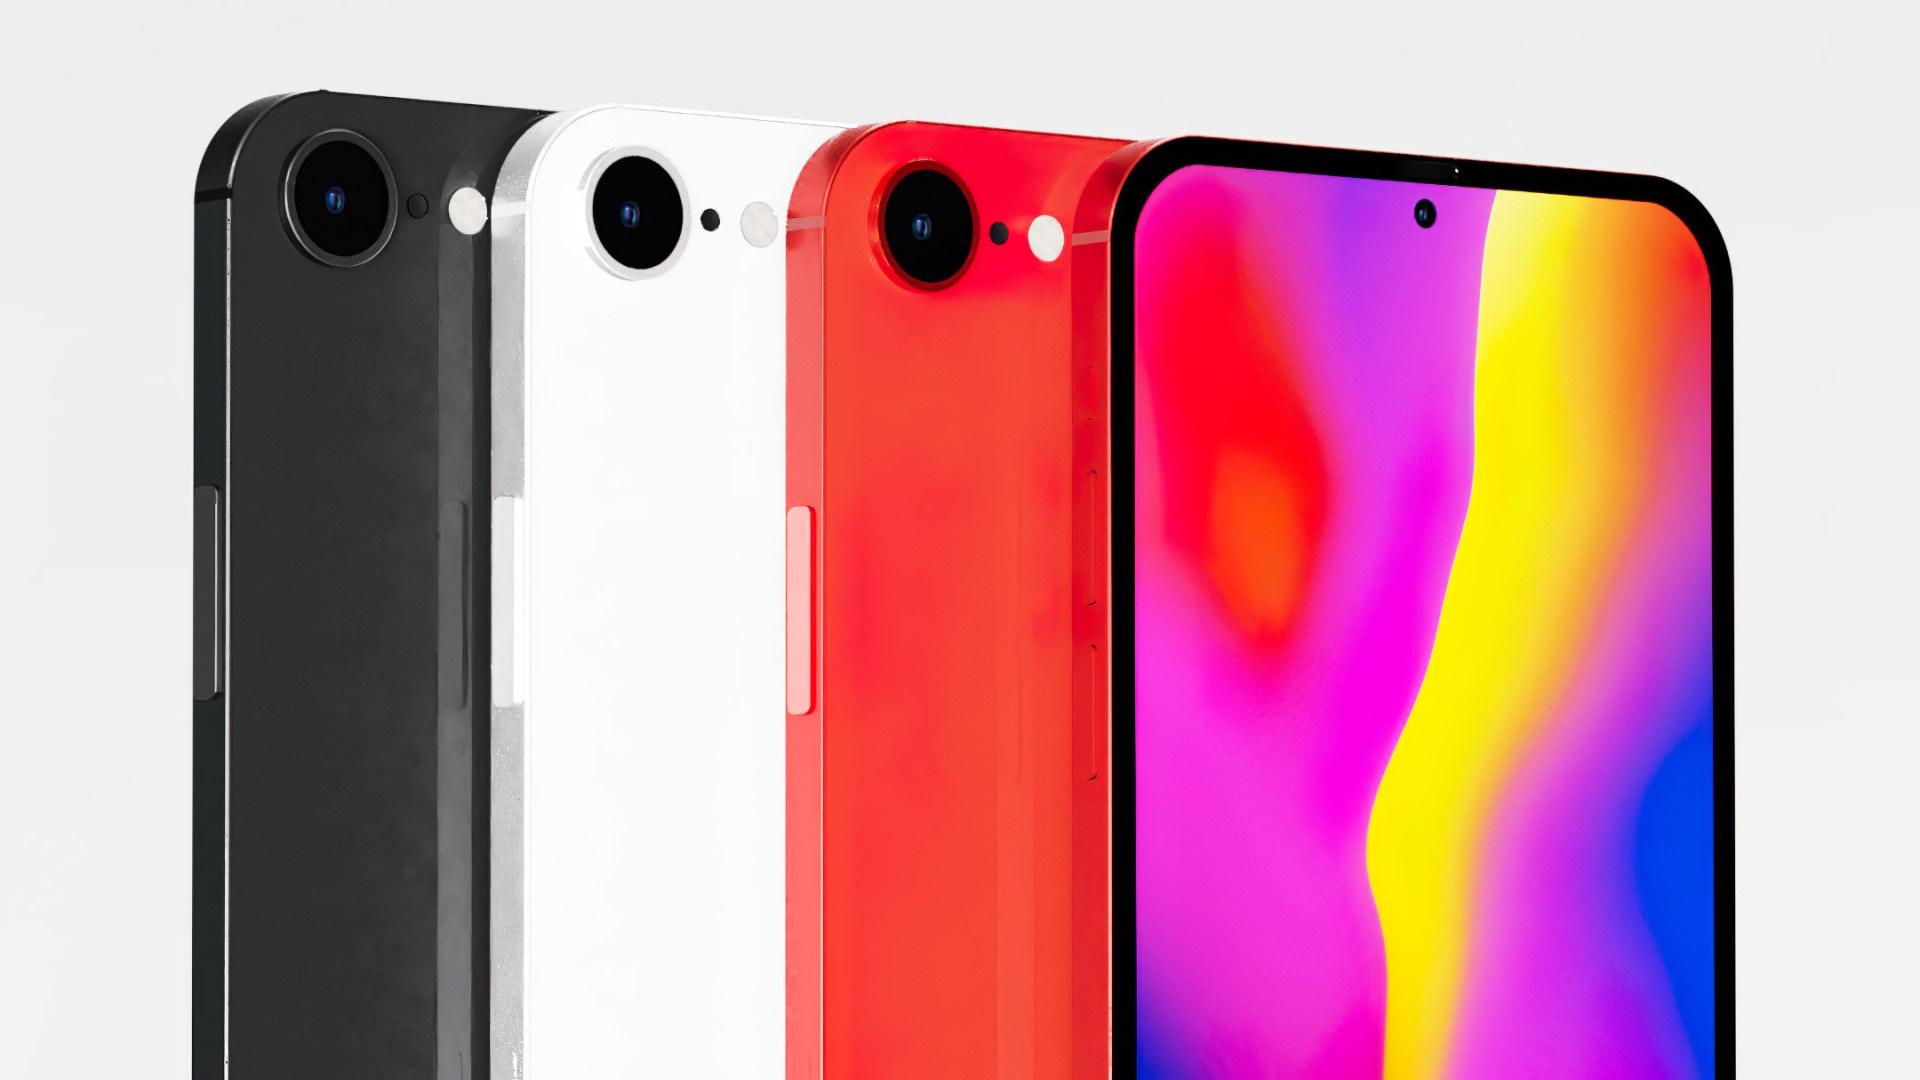 iPhone SE 2021: Erste Konzept-Bilder zeigen Smartphone ...